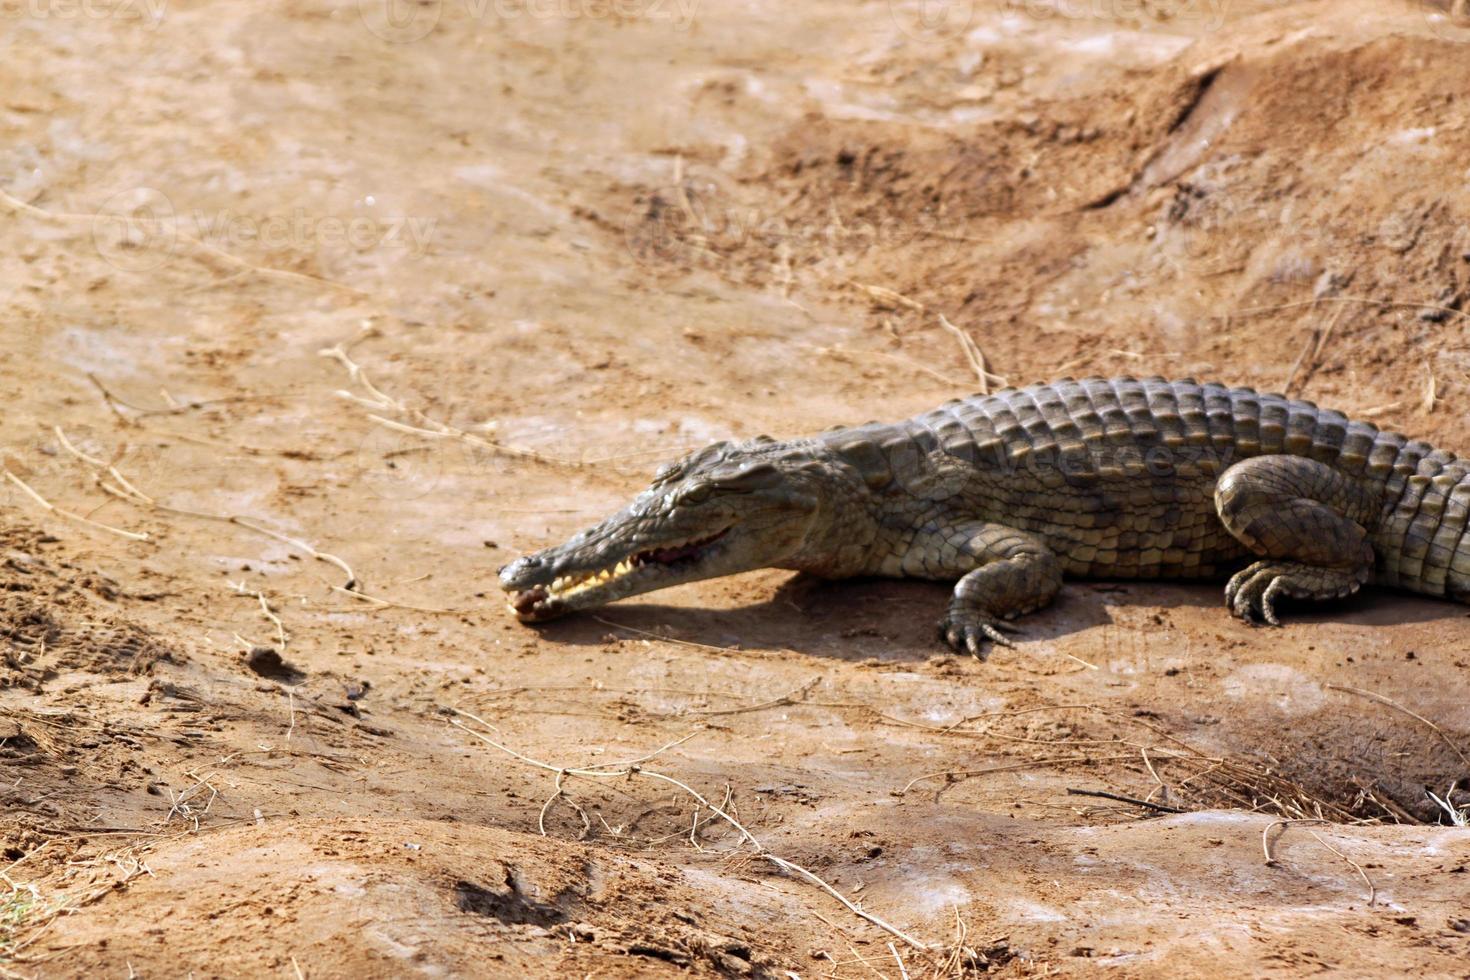 sabana de cocodrilos, tsavo east park en kenia foto